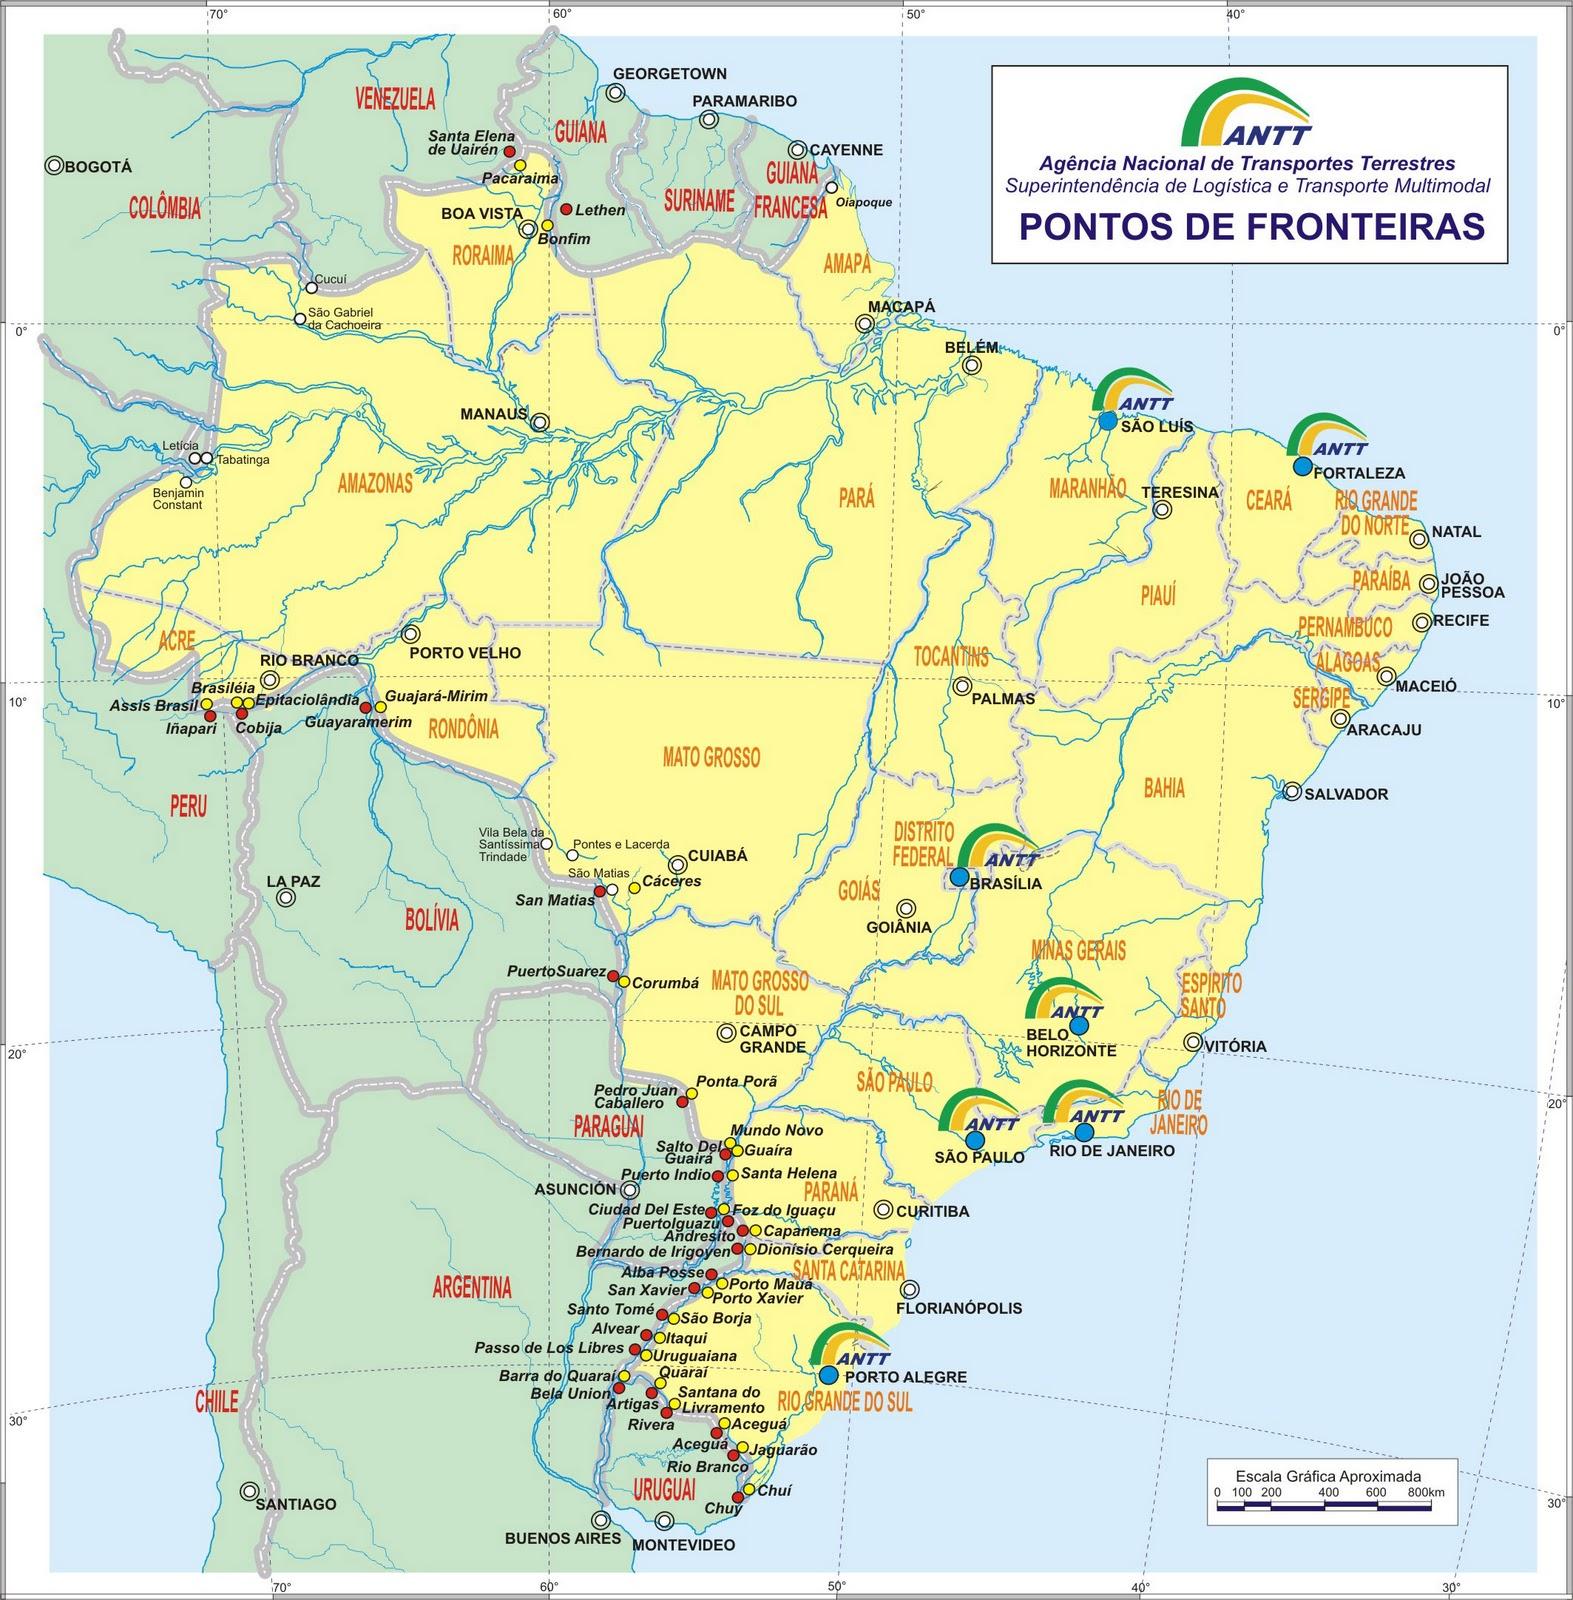 maps of Brazil - a link atlas